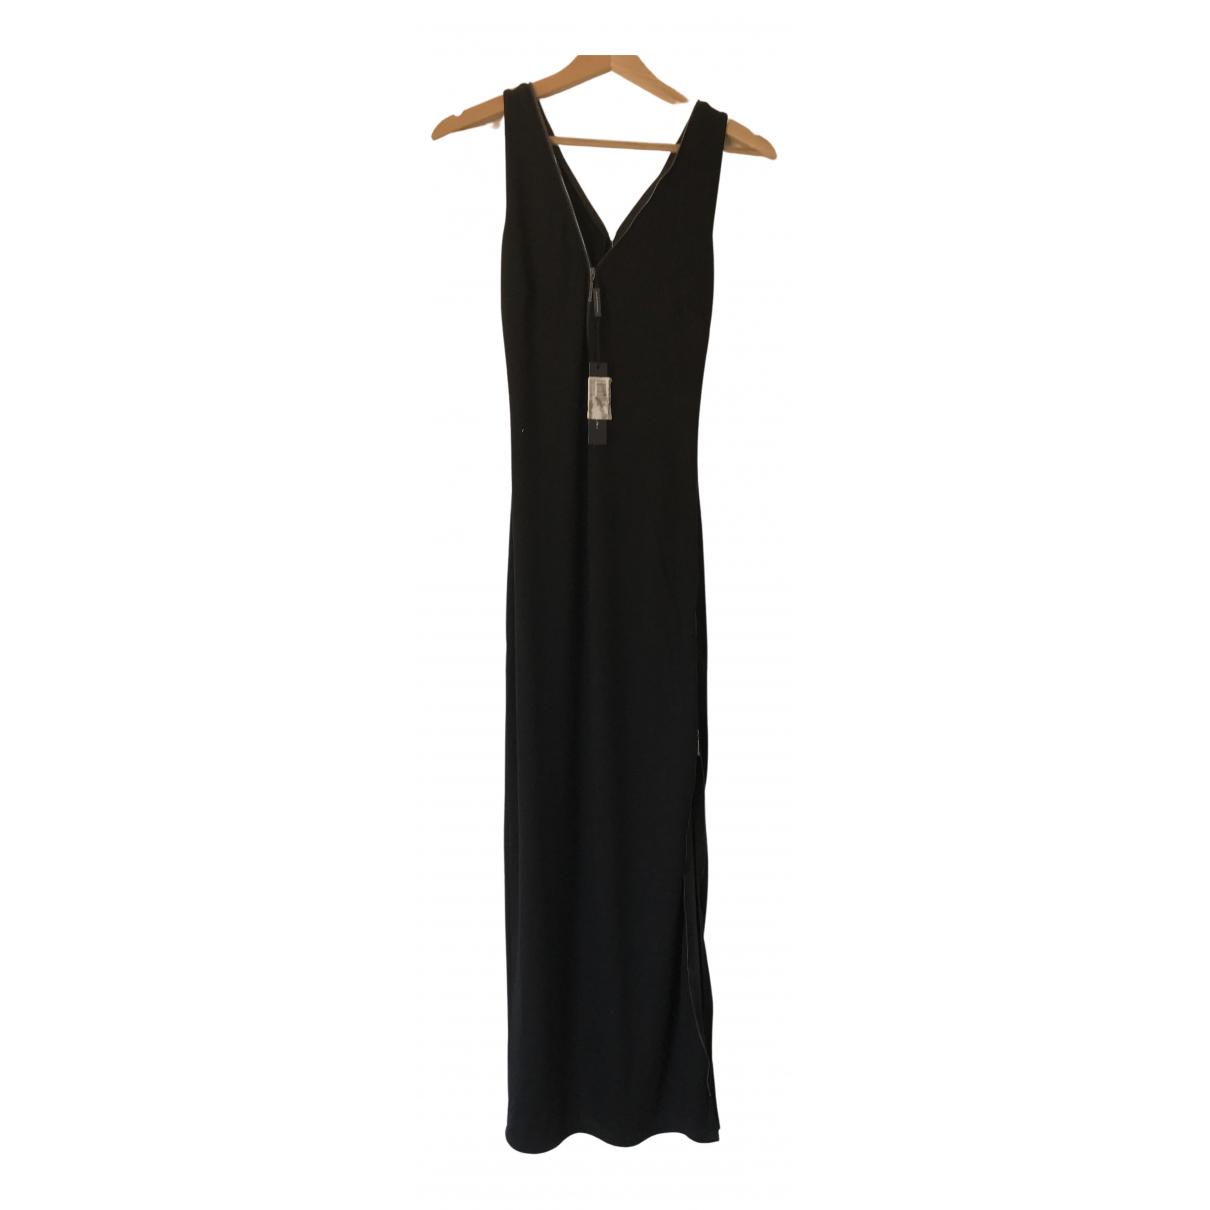 Elie Tahari - Robe   pour femme en coton - elasthane - noir